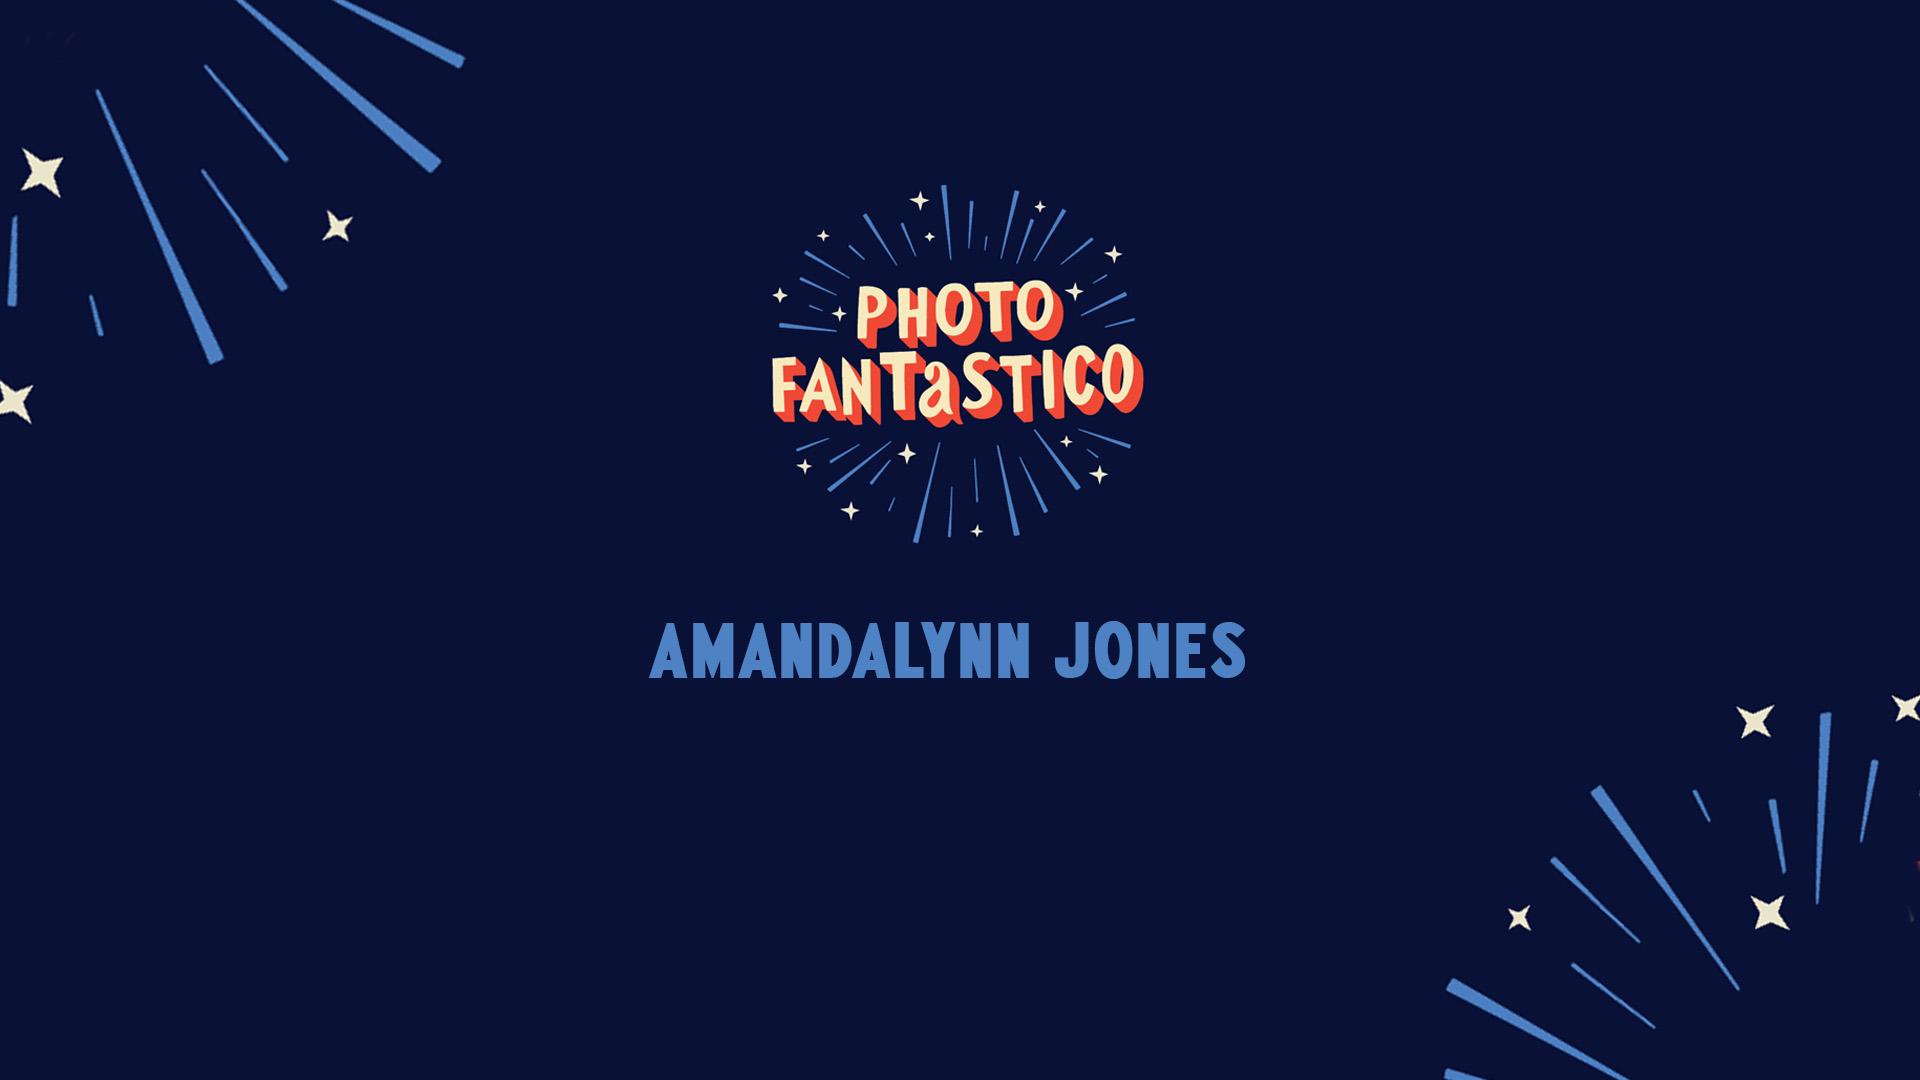 Amandalynn Jones